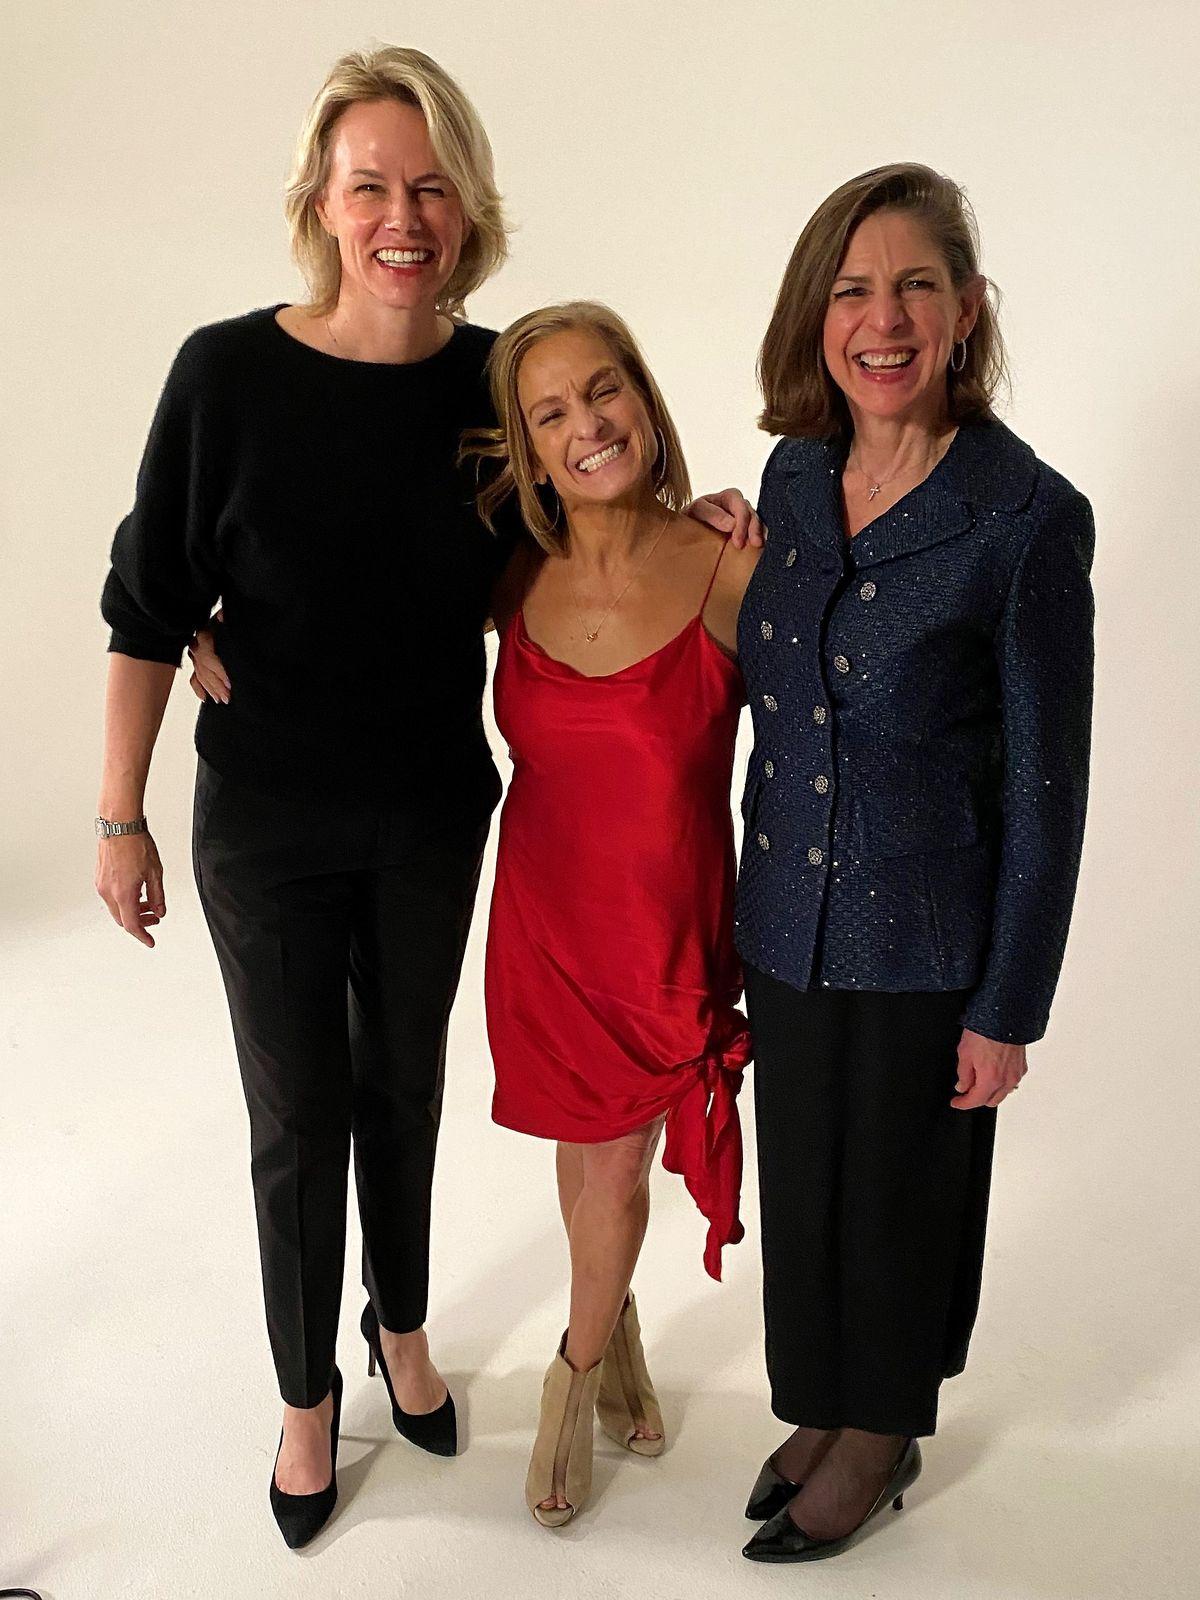 Molly Fletcher, Mary Lou Retton and Diane Paddison. Photo courtesy of 4word.jpg